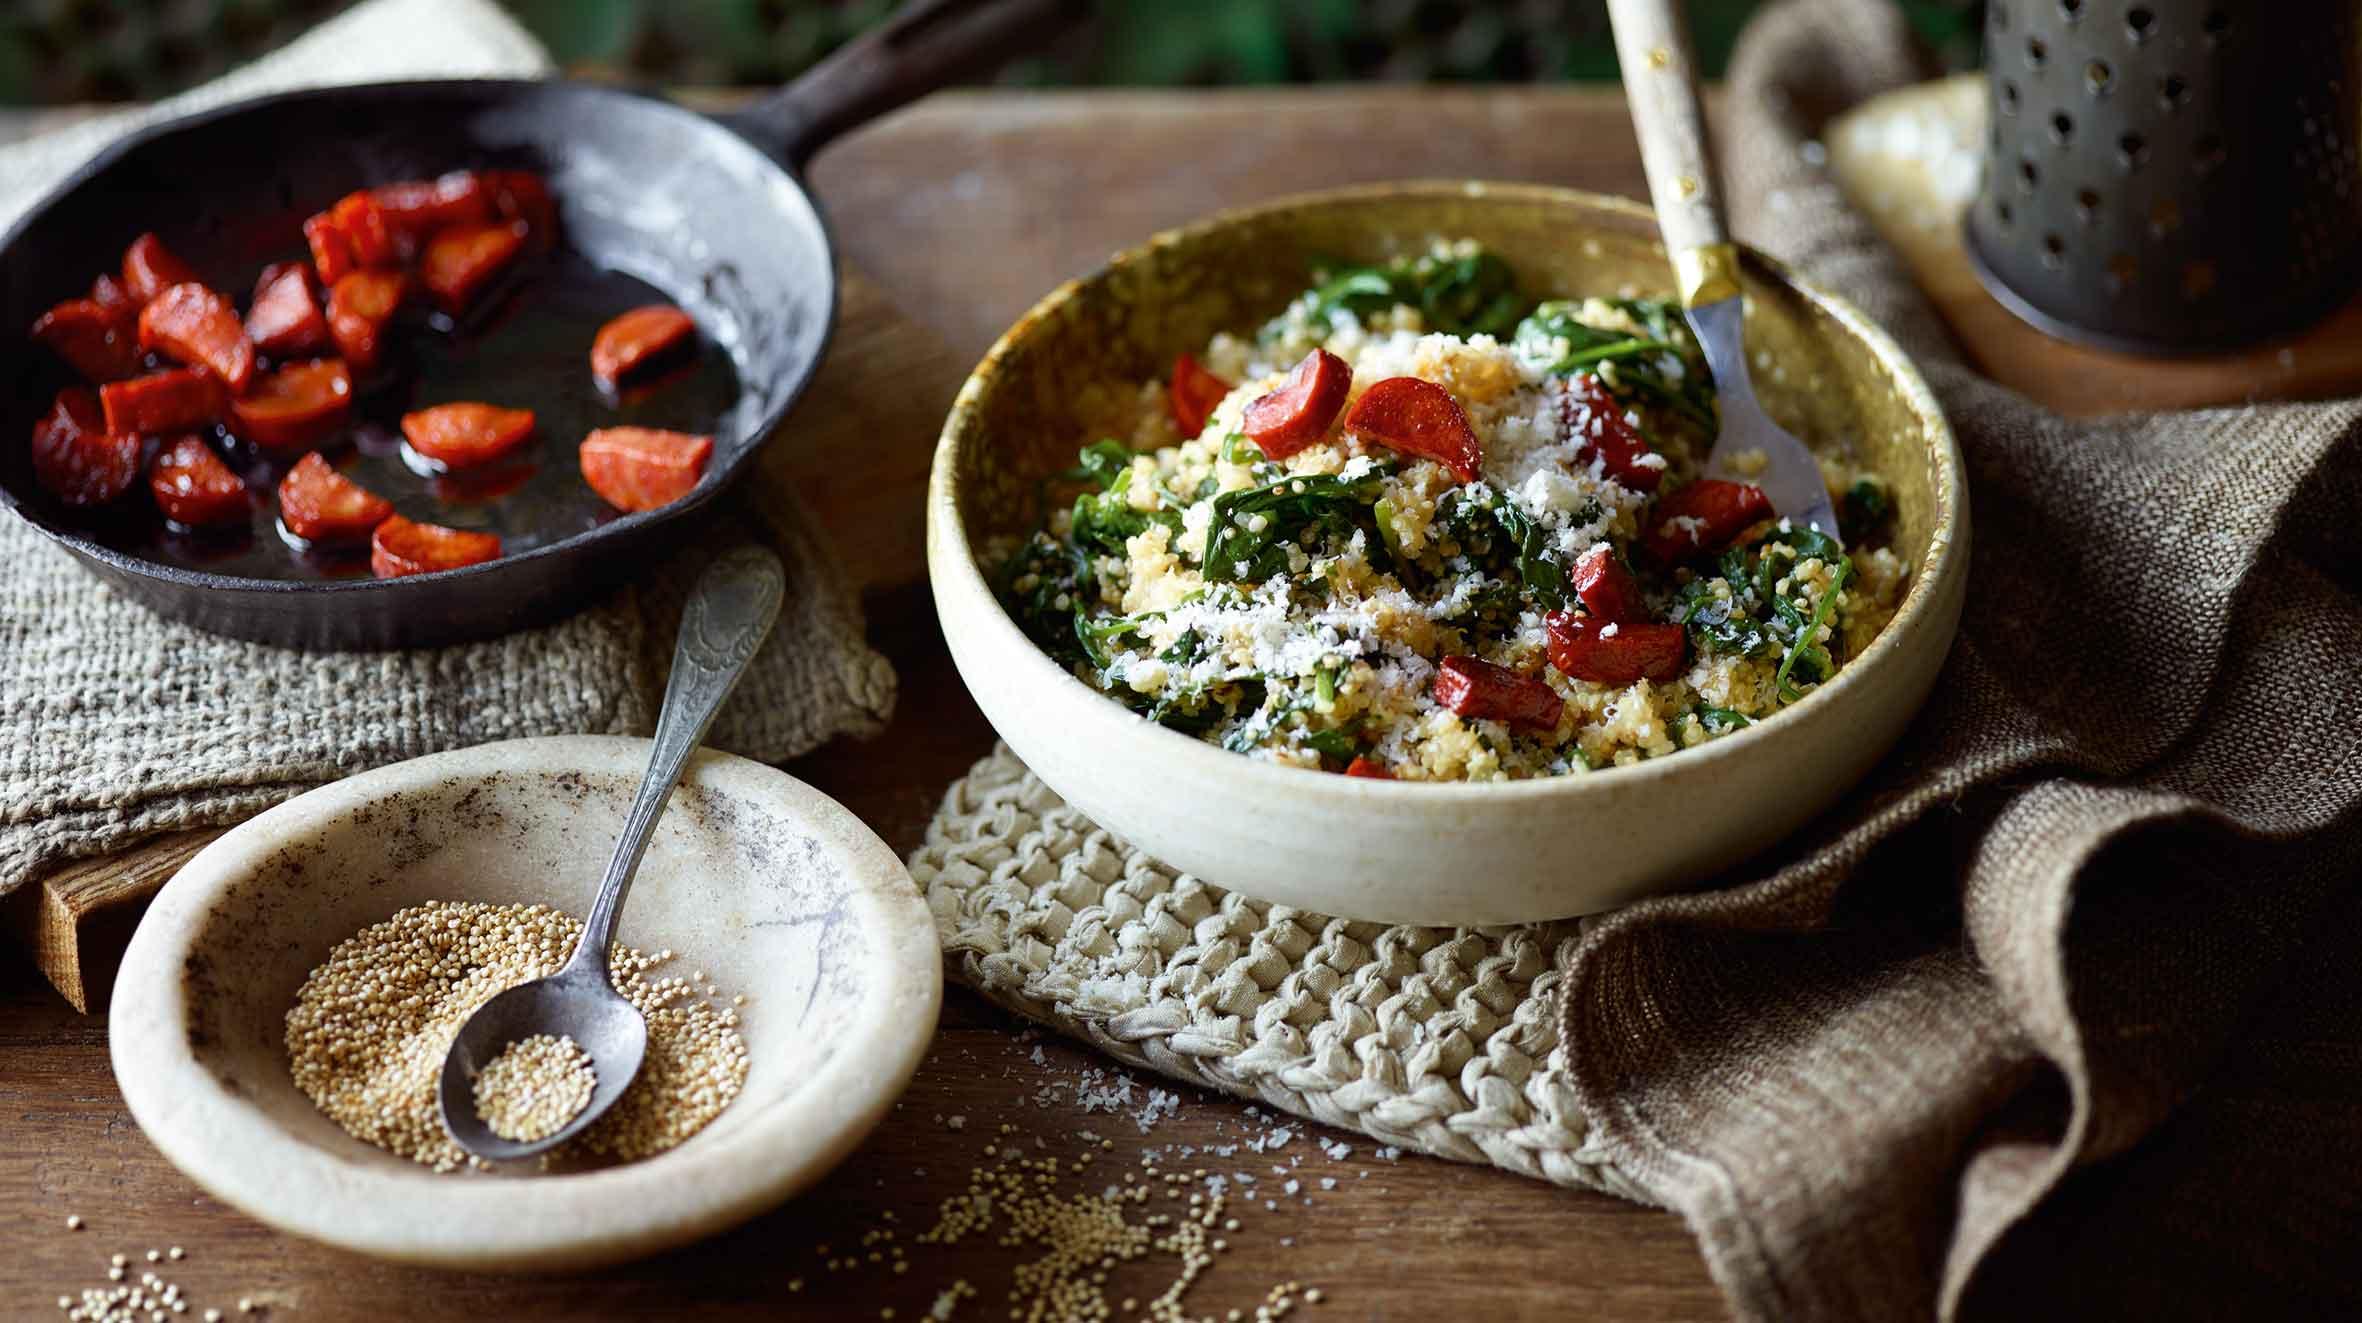 Quisotto ze szpinakiem i chorizo